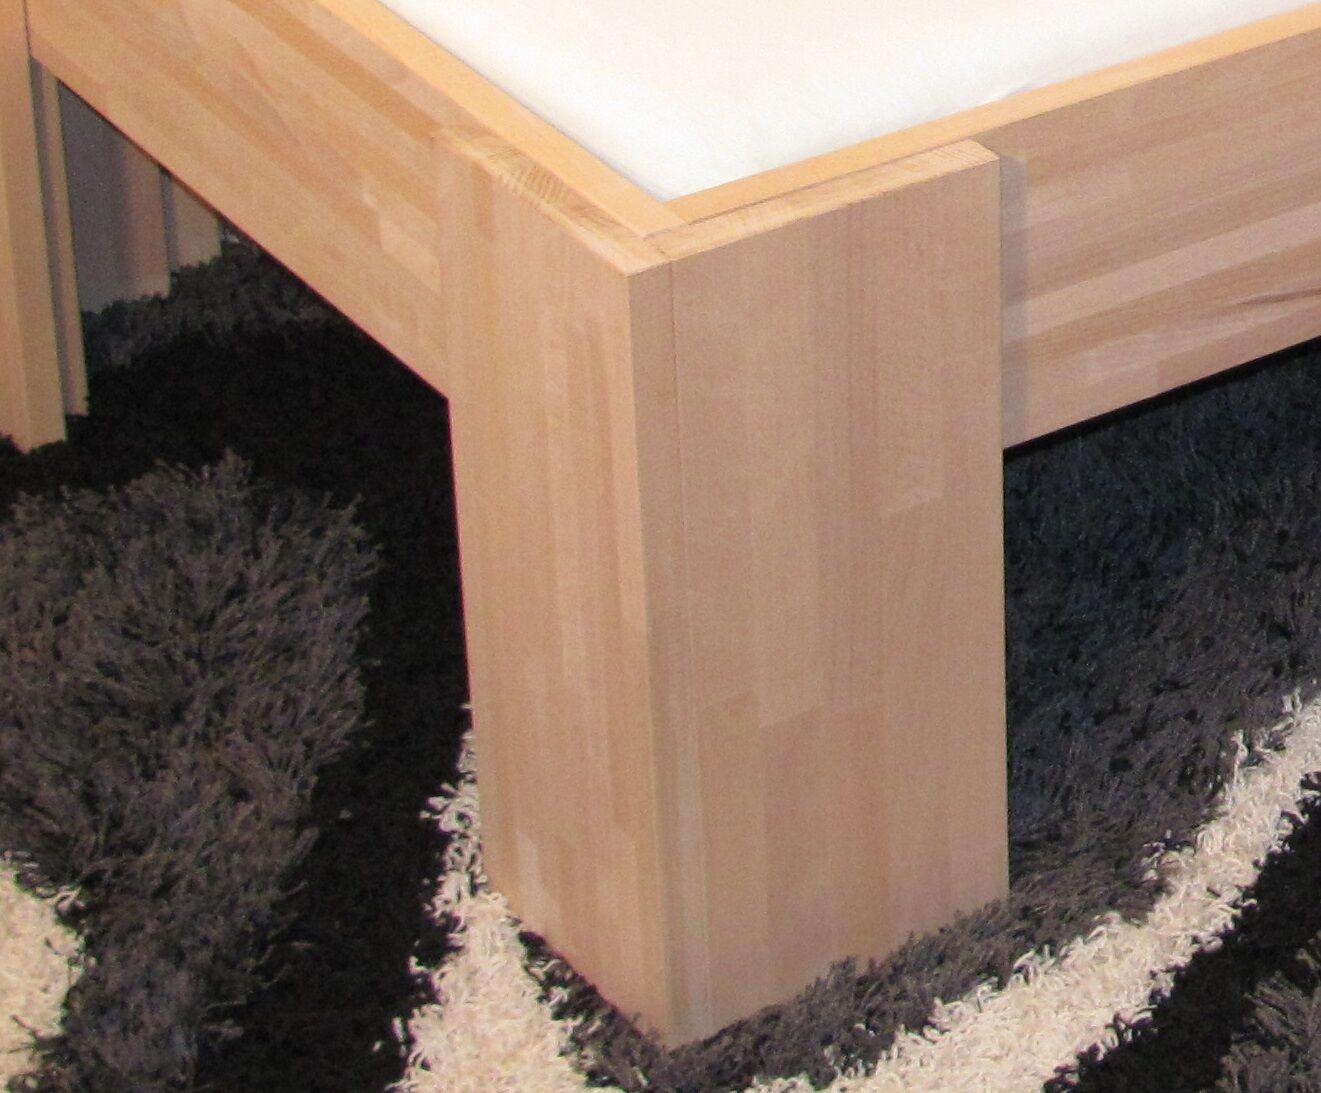 27mm holz bett vollholz echtholz massivholzbett 90x200 einzelbett senioren fu i eur 185 00. Black Bedroom Furniture Sets. Home Design Ideas